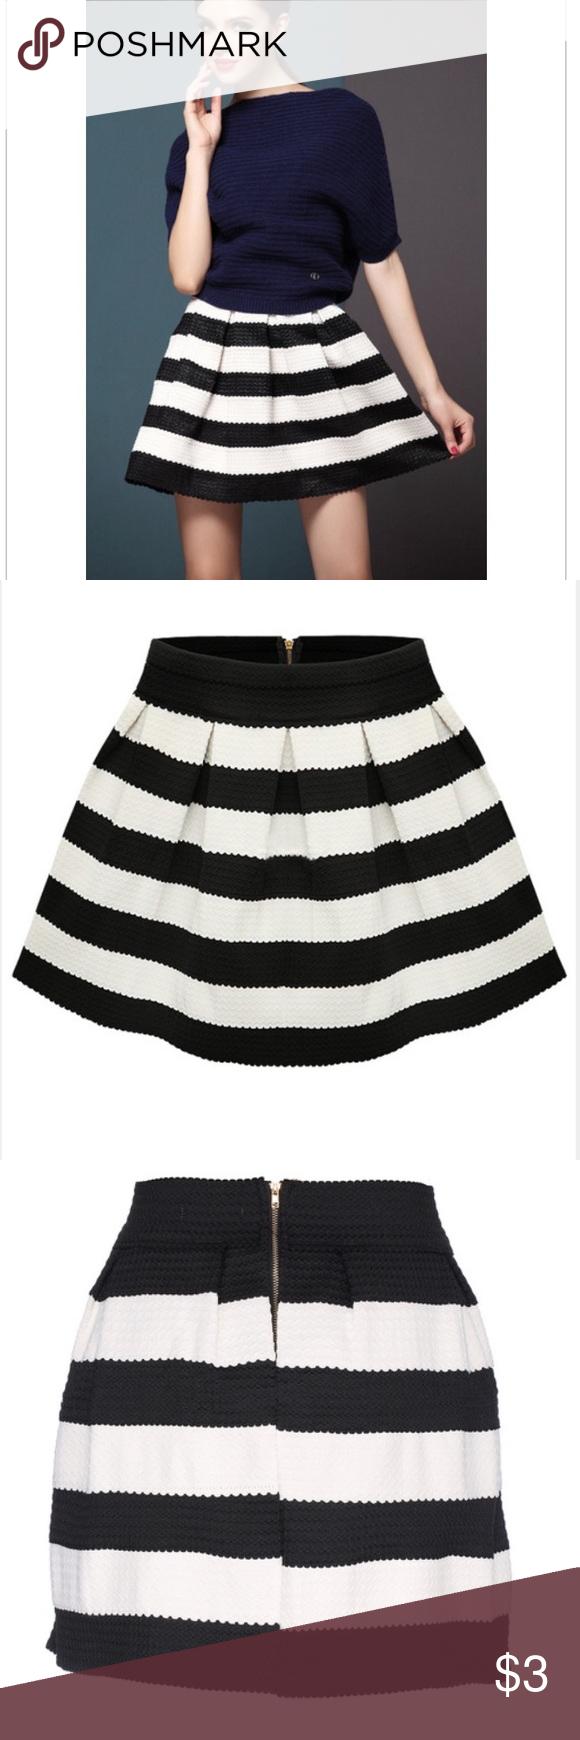 25ba2c118b Black Striped Elastic Pleated Bandage Skater Skirt Black Apricot Striped  Elastic Pleated Skirt Pattern Type :